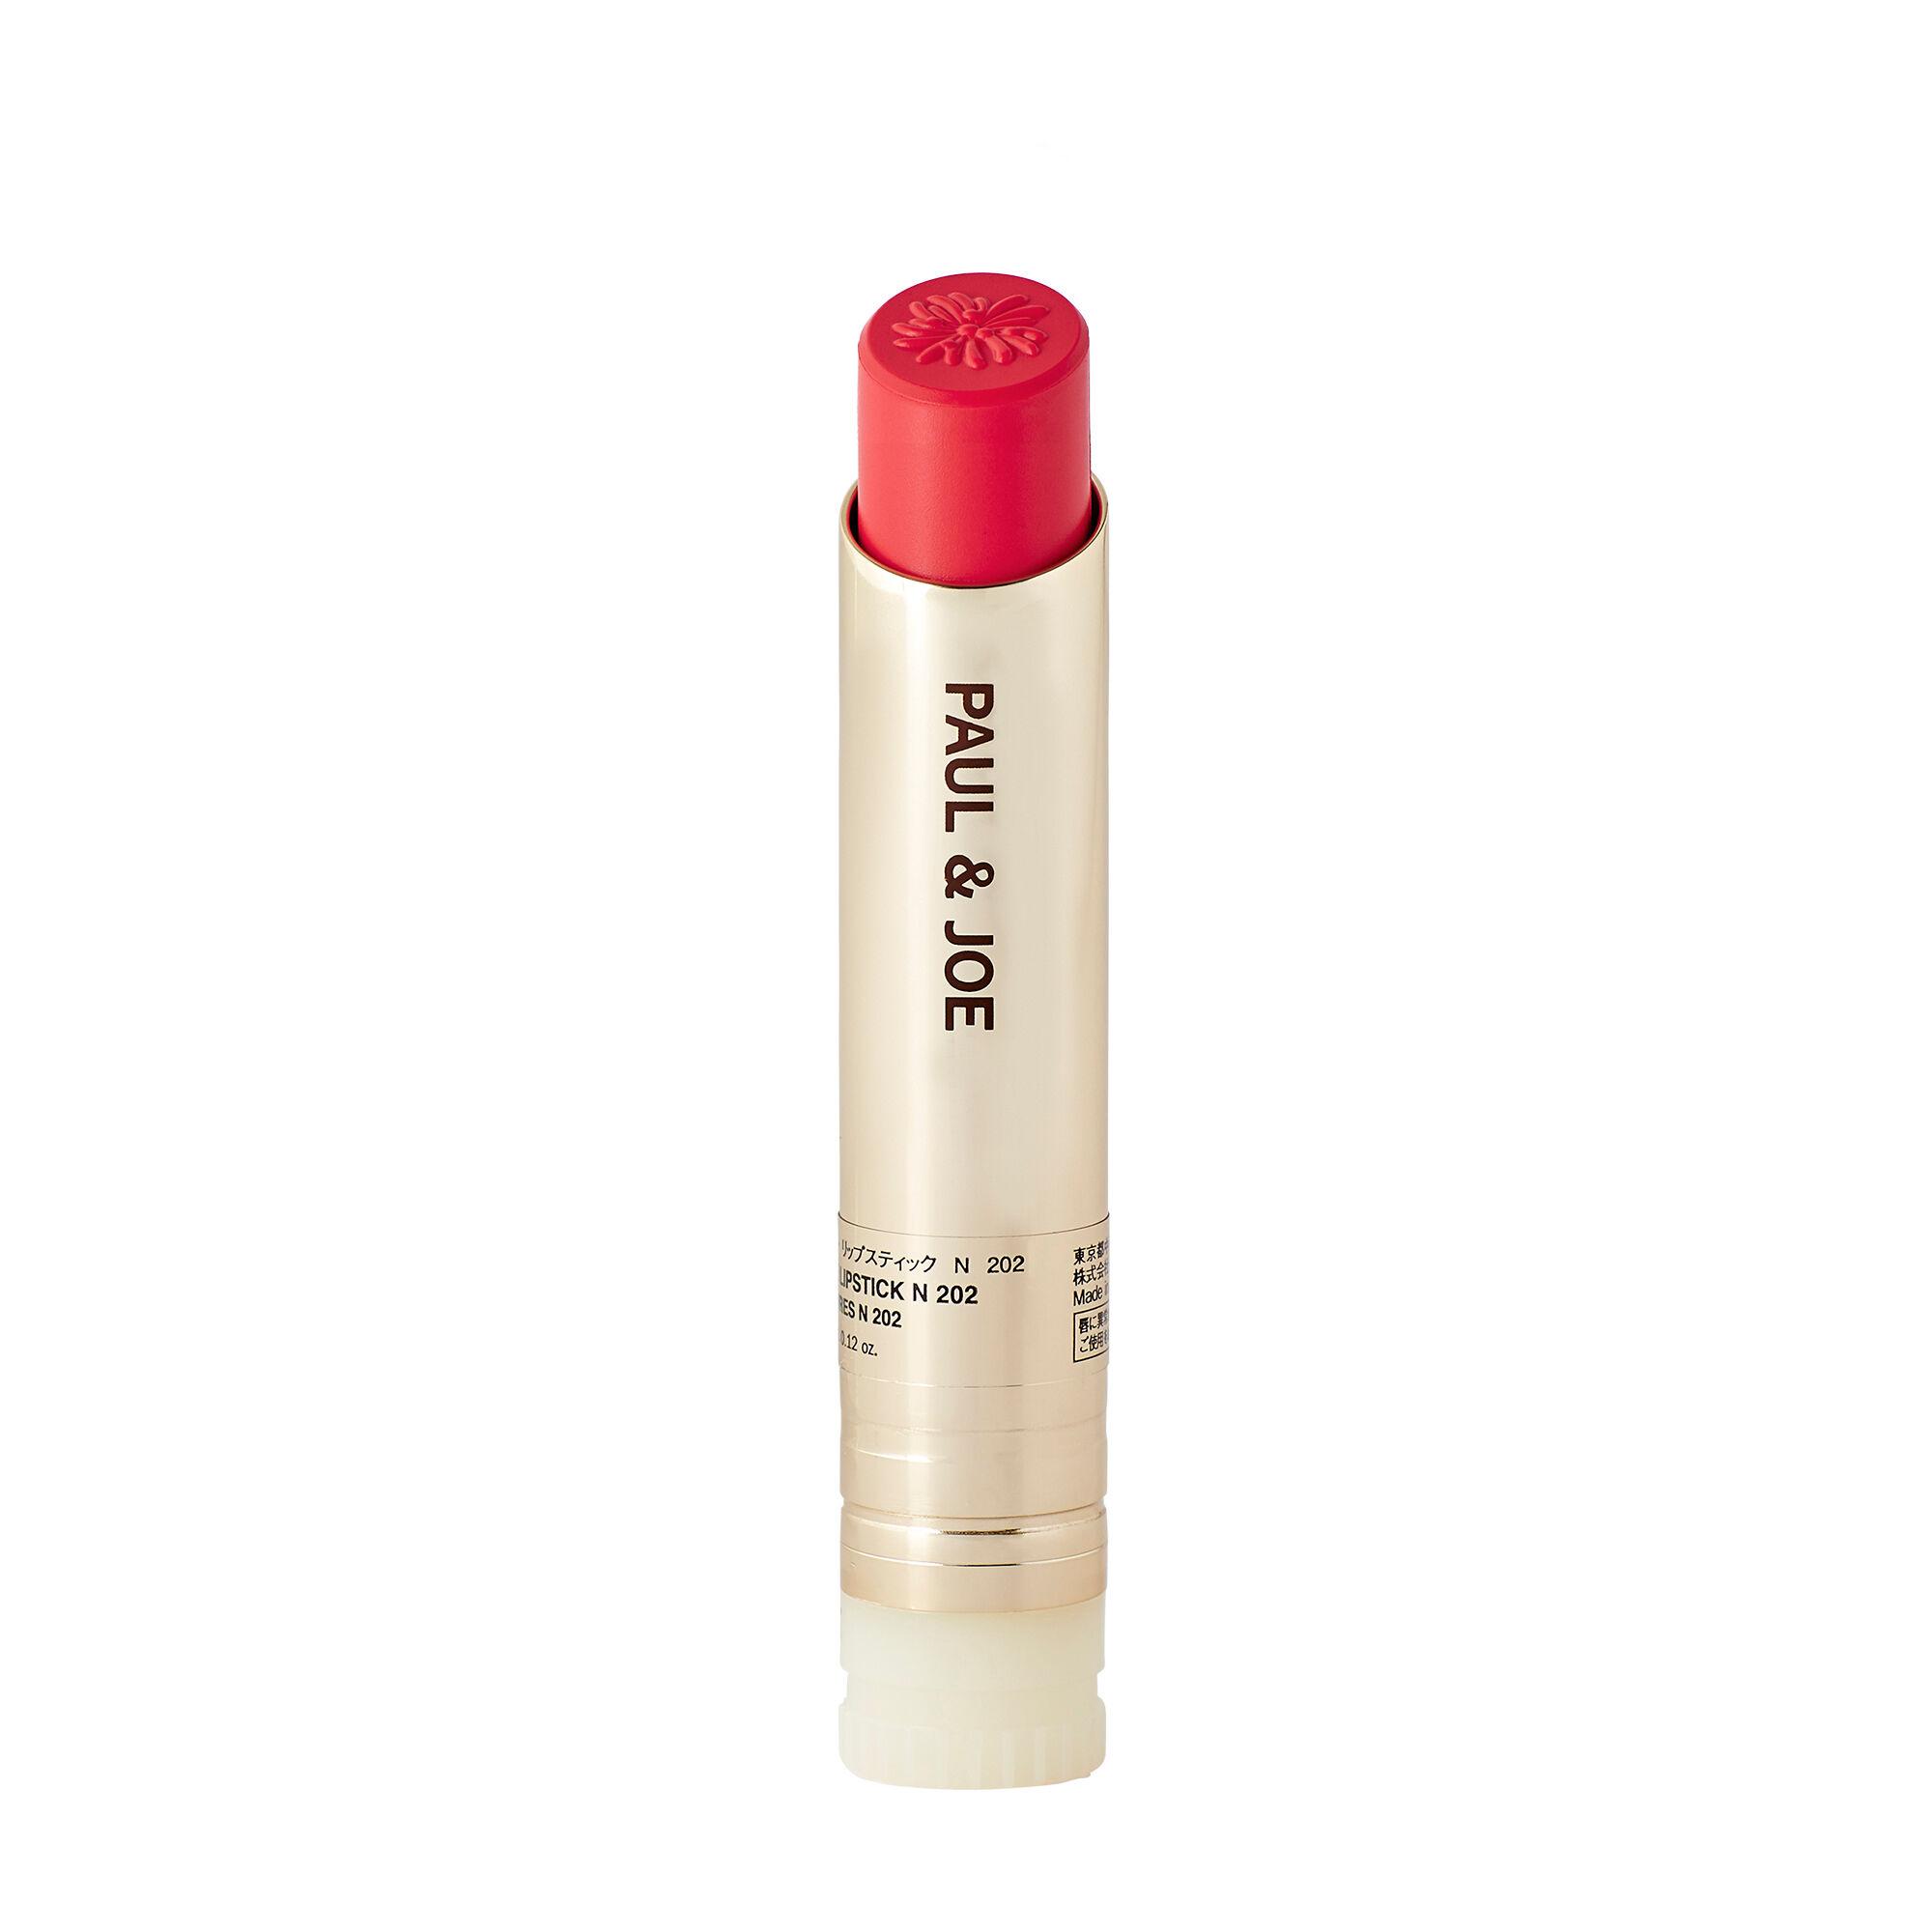 Paul & Joe Lipstick N Medium Finish 202 Silk Stockings 3.5g